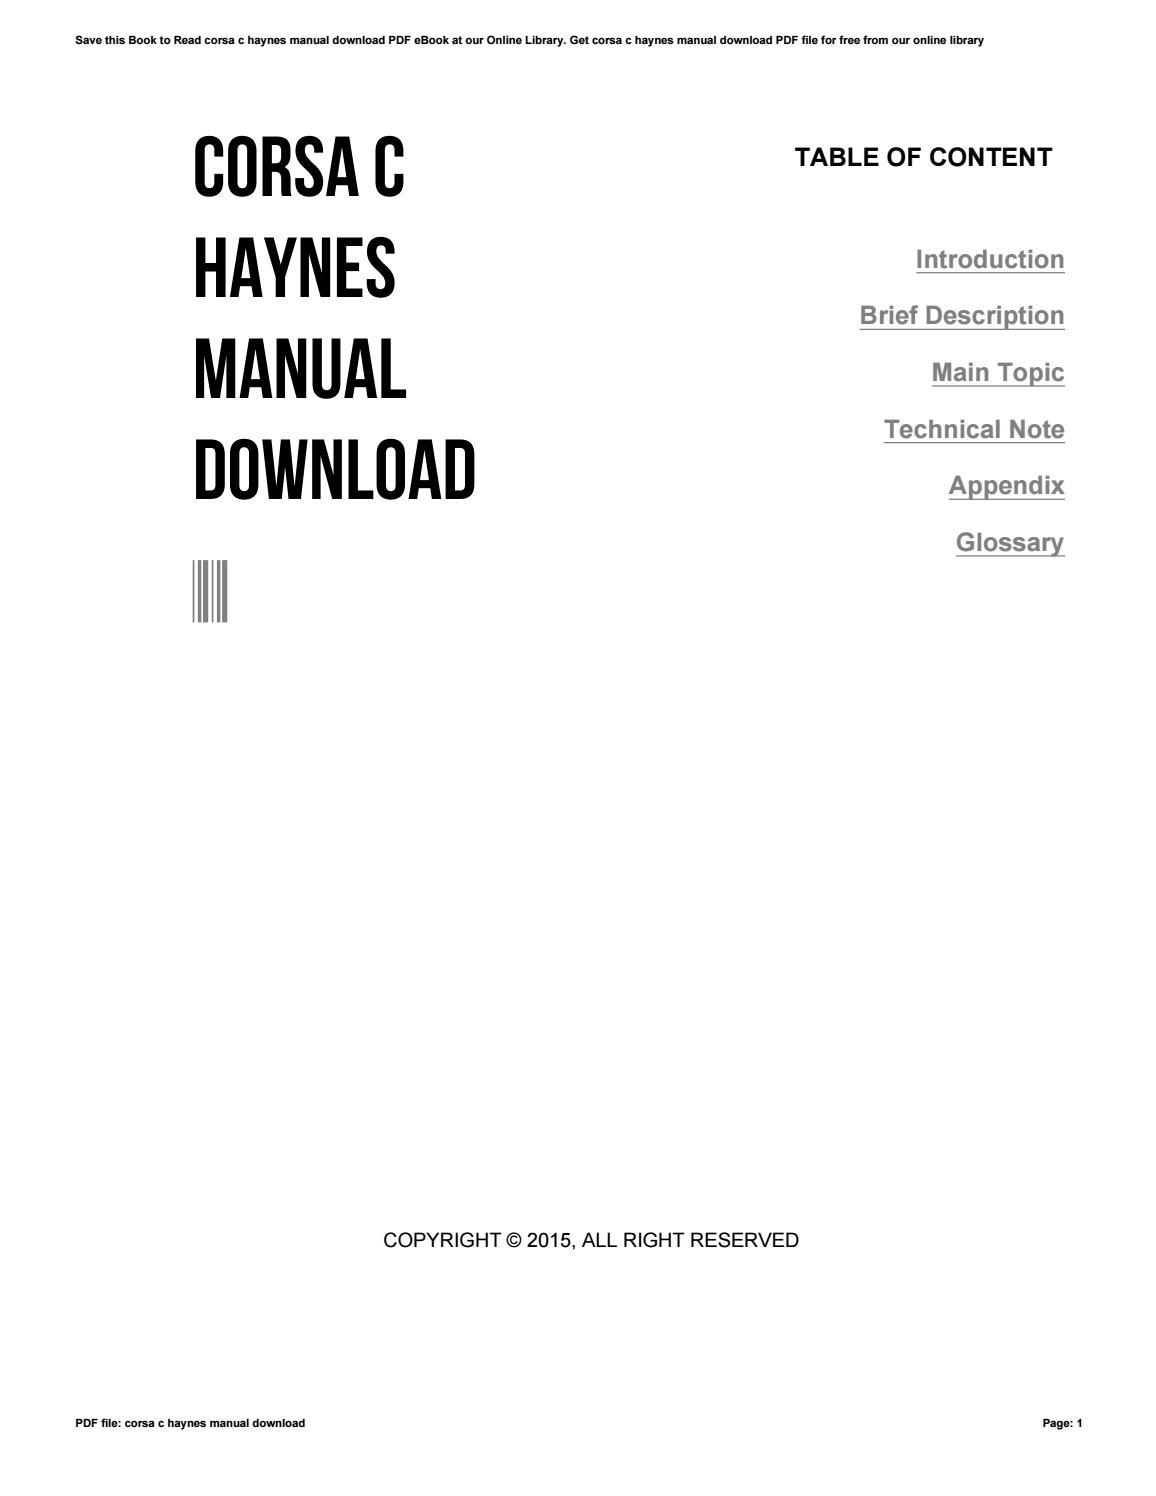 corsa c haynes manual free download